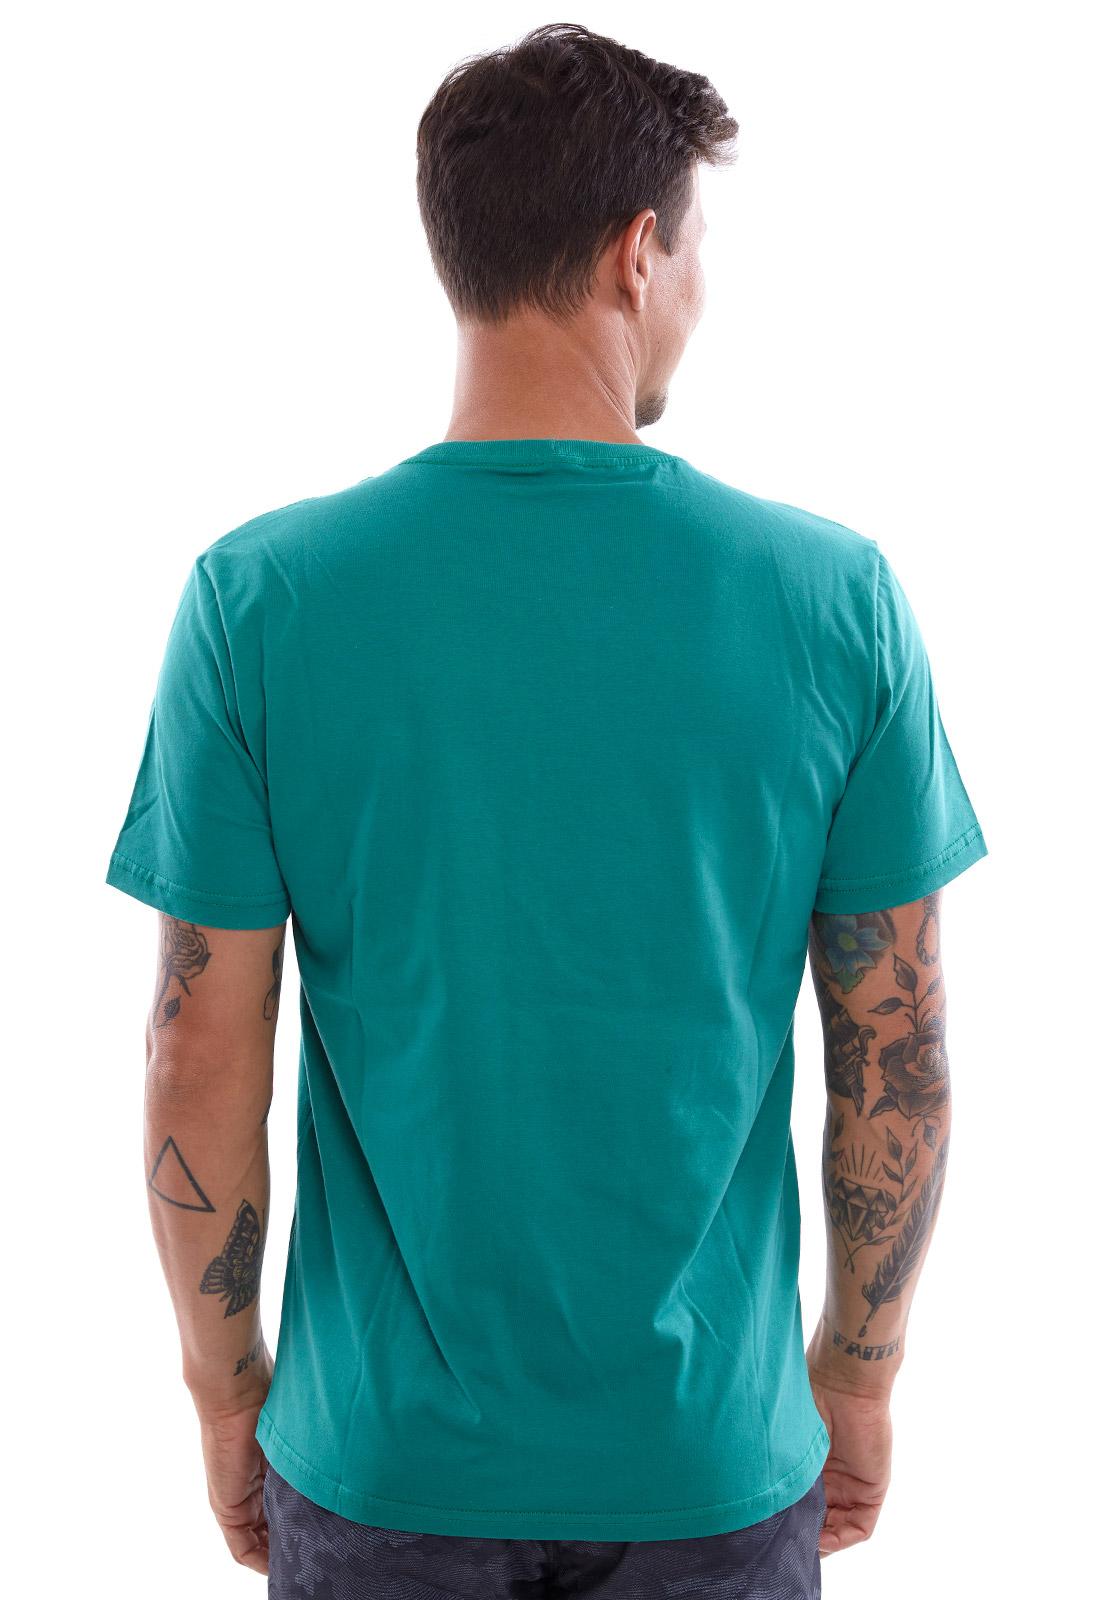 Camiseta Vida Marinha Manga Curta Azul Petróleo